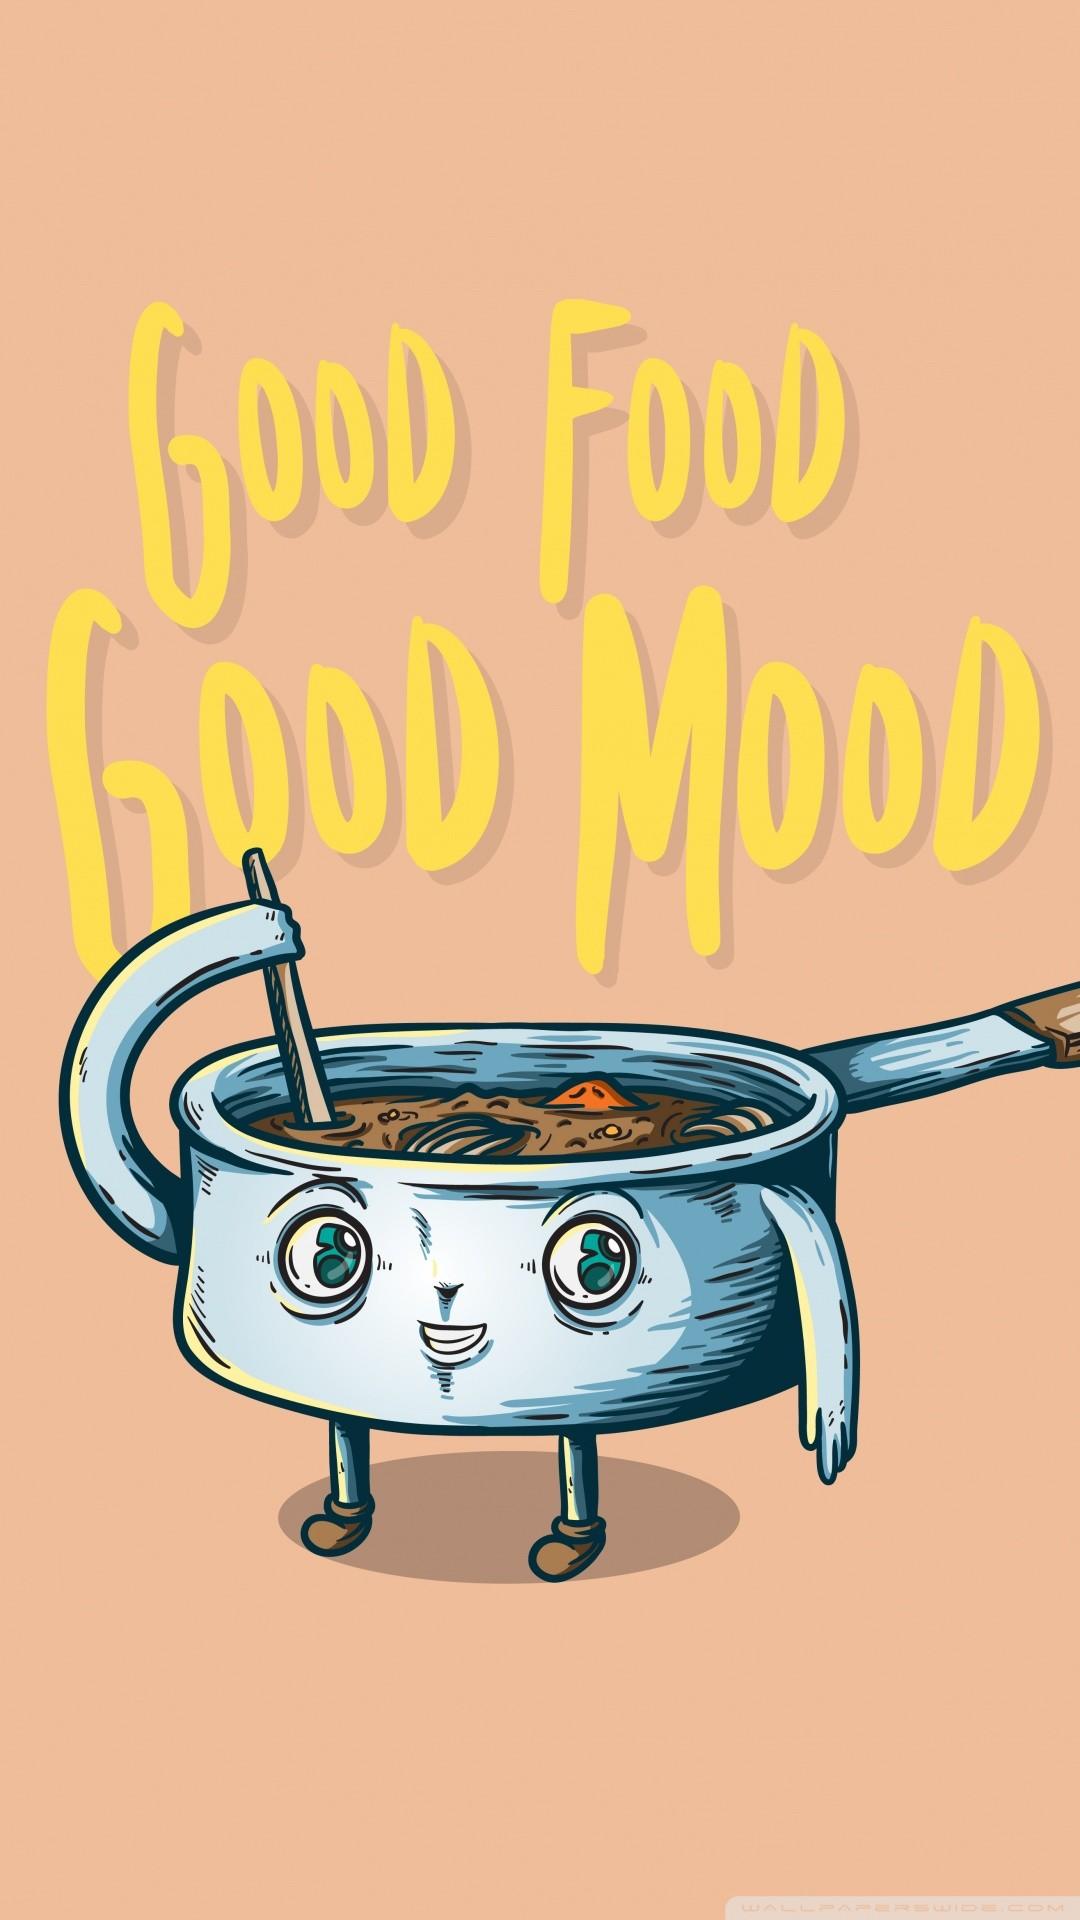 Free Good Food, Good Mood phone wallpaper by beckas7665